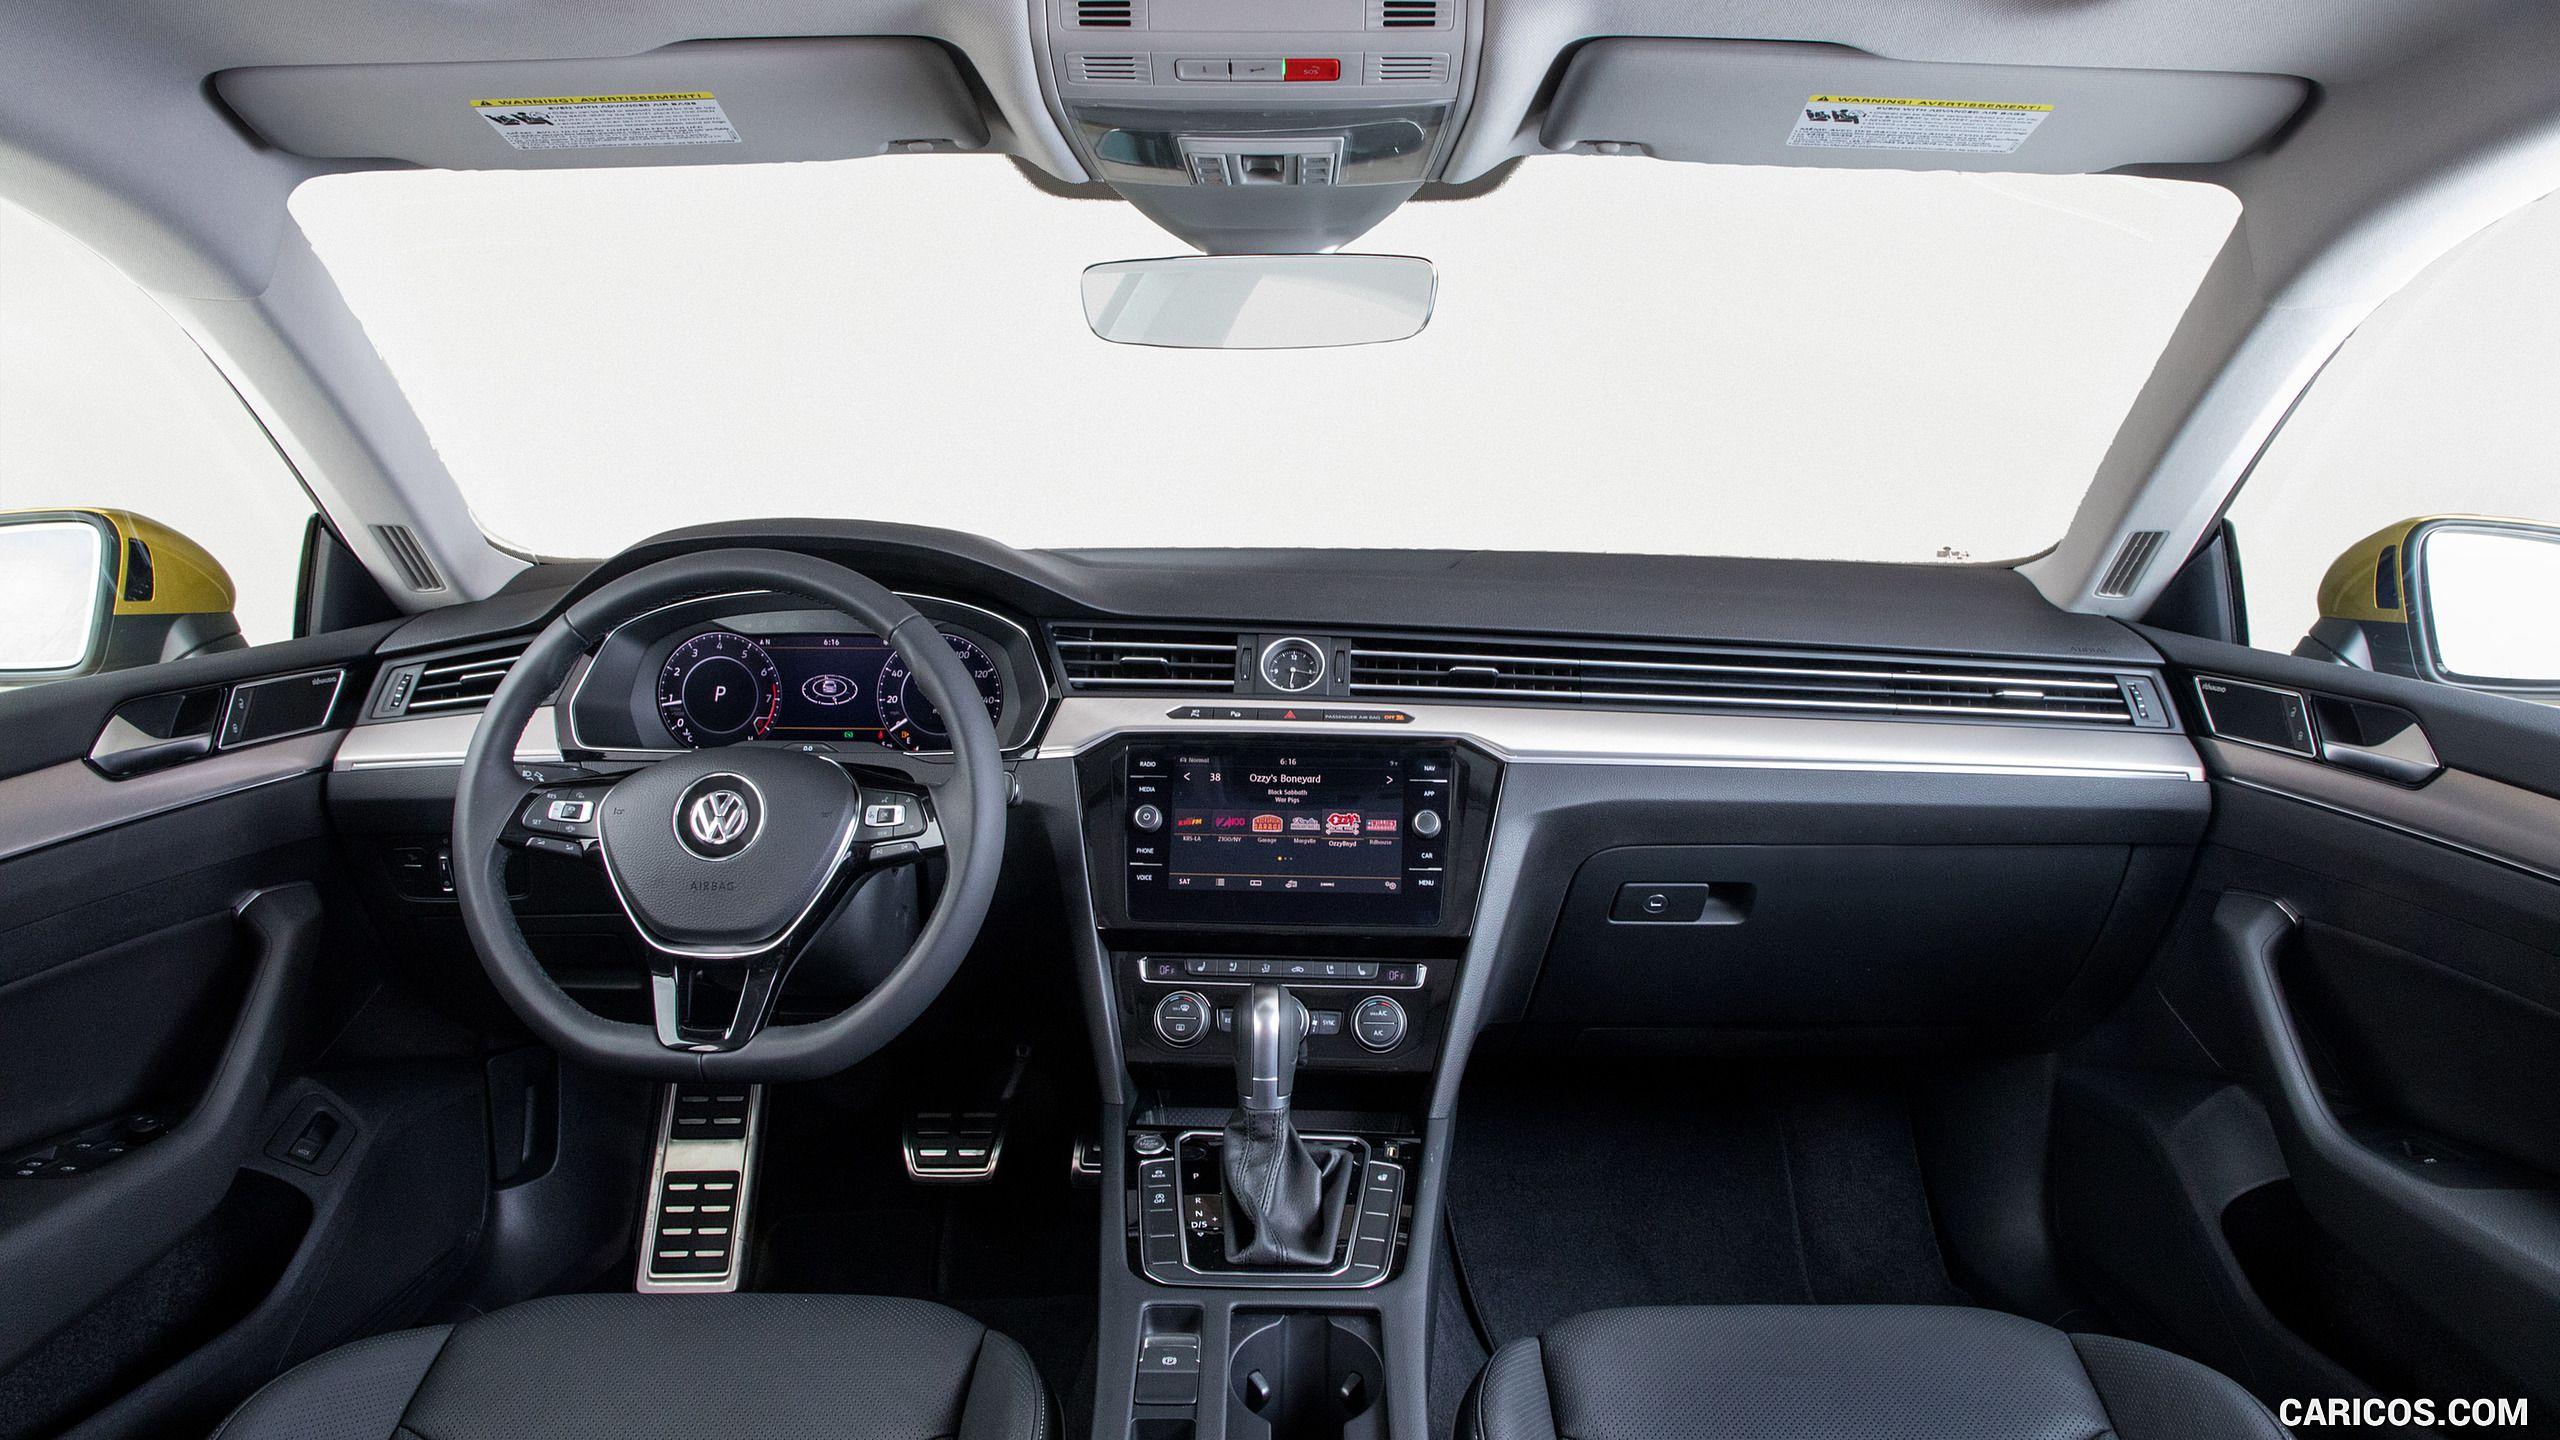 VW Arteon Usa >> 2019 Volkswagen Arteon Us Spec Interior Cockpit Hd